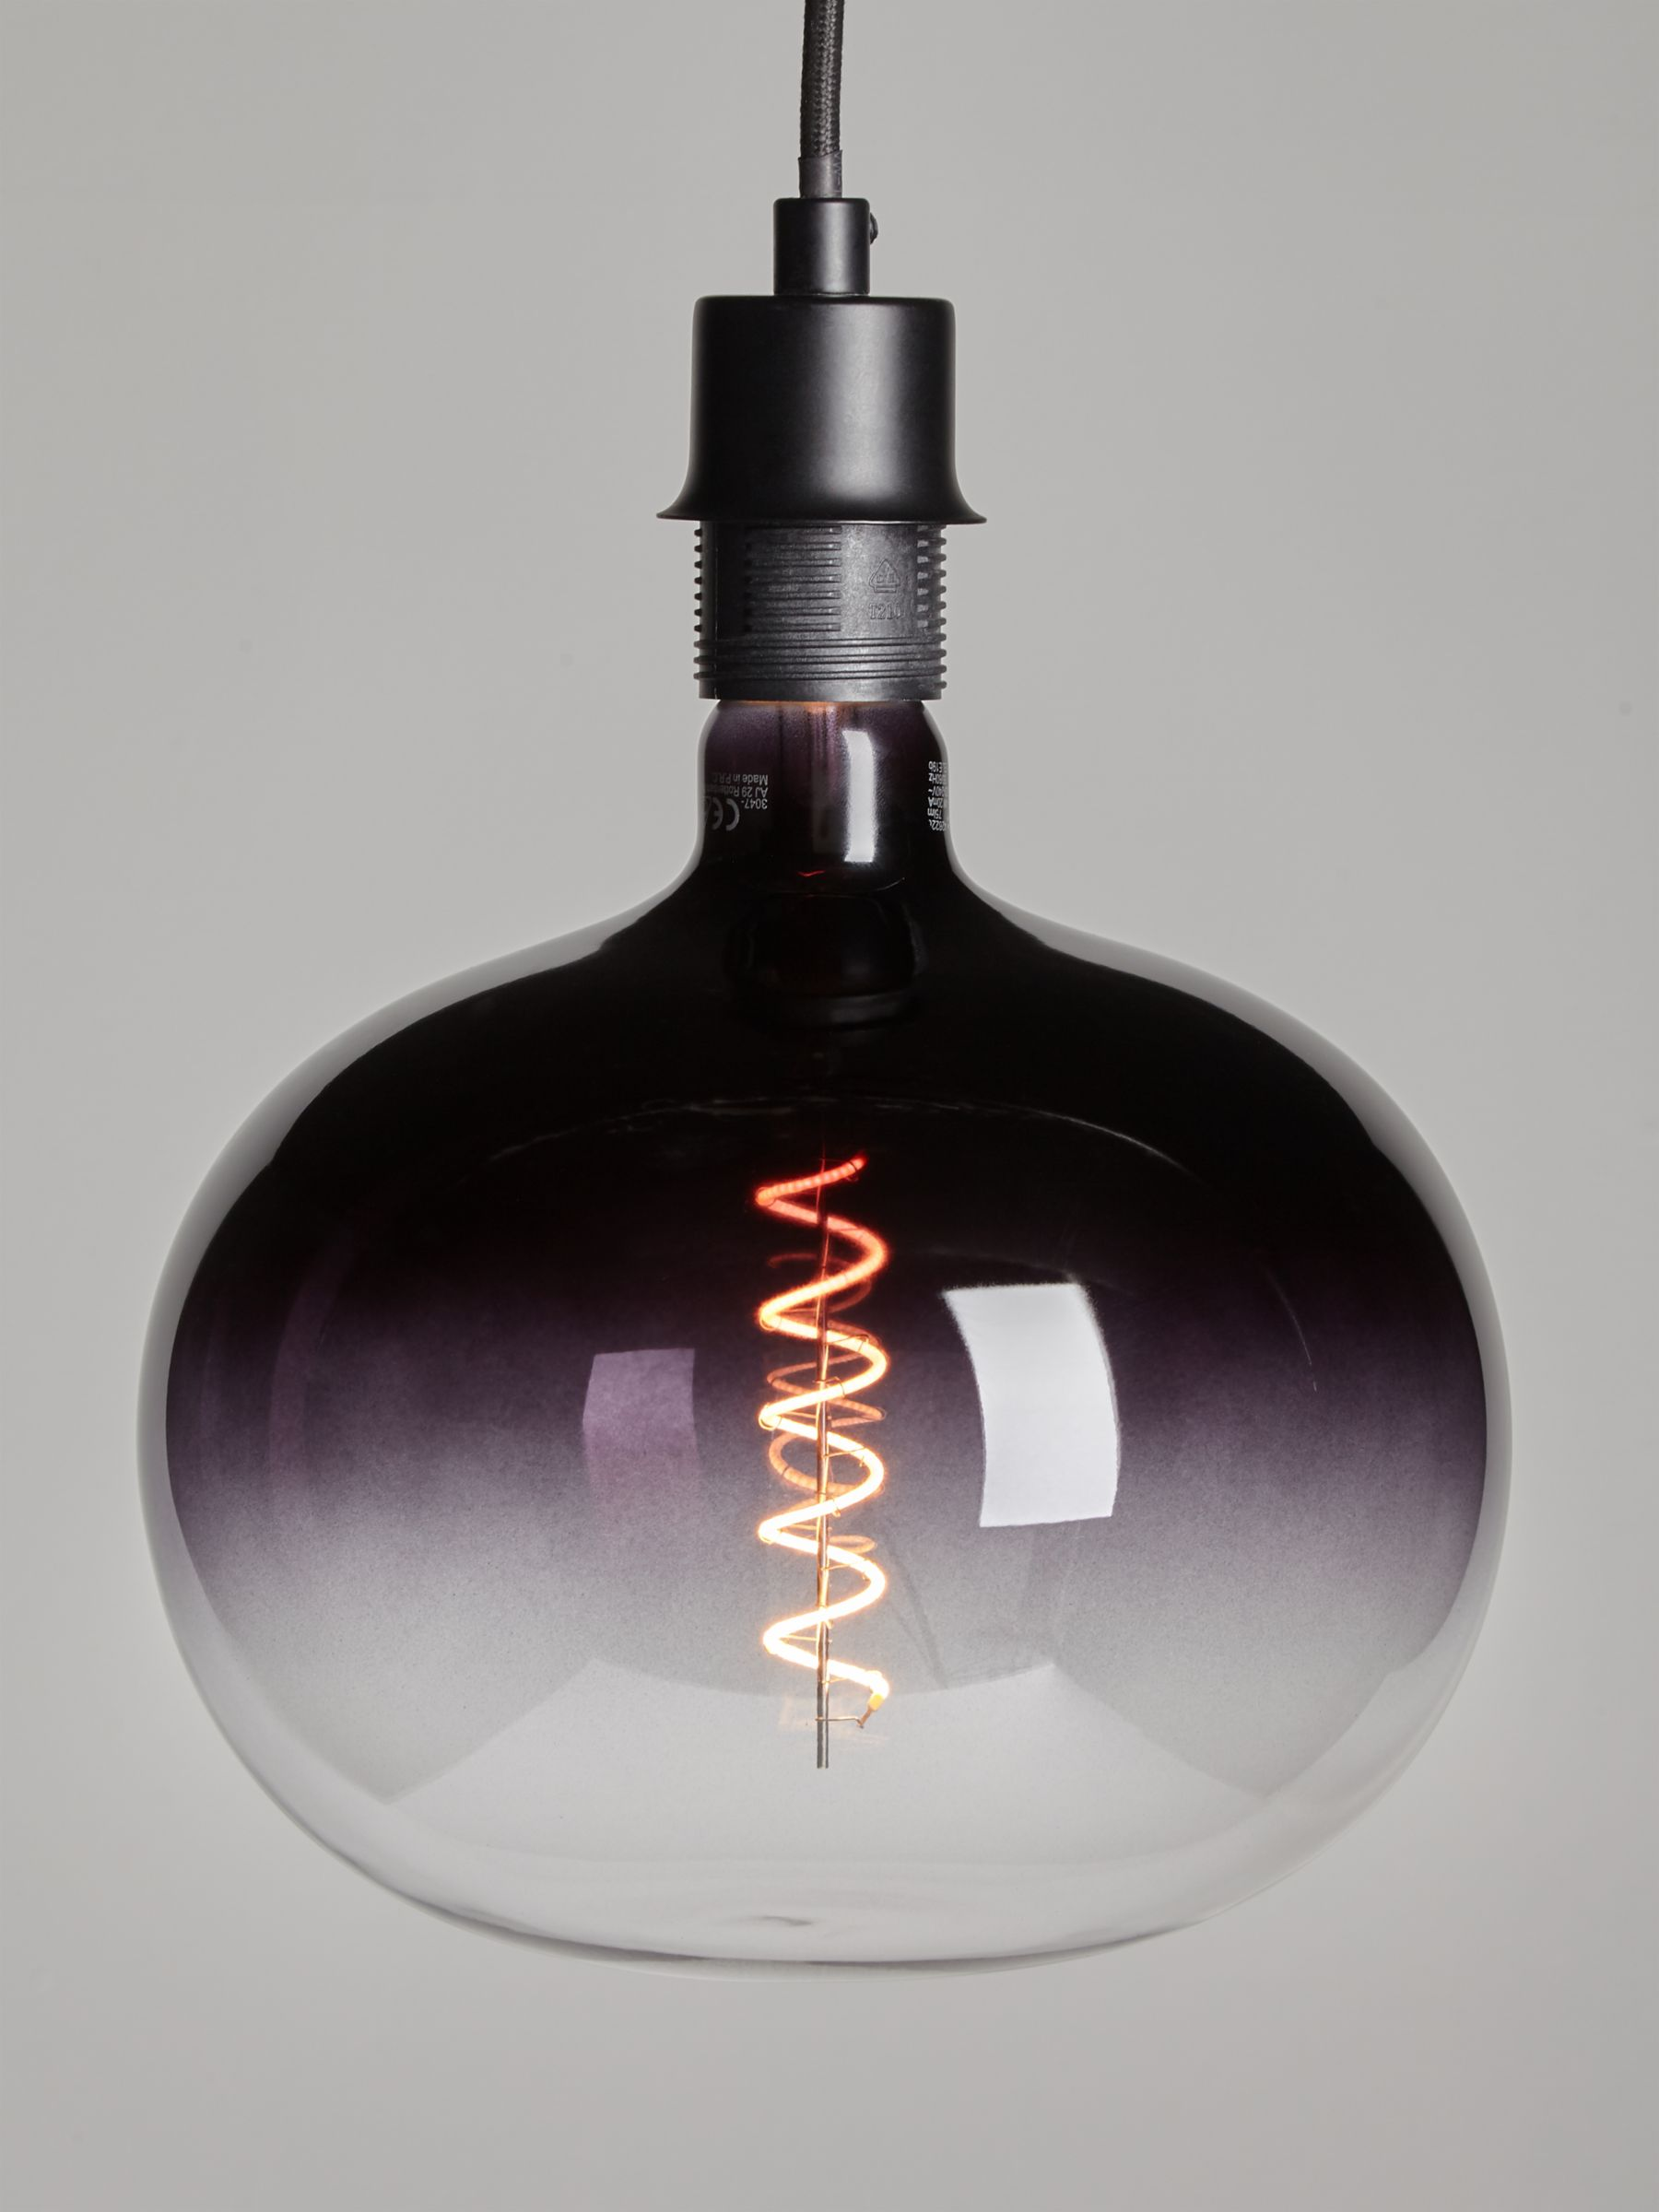 Calex Calex Boden 4W ES LED Dimmable Filament Bulb, Moonstone